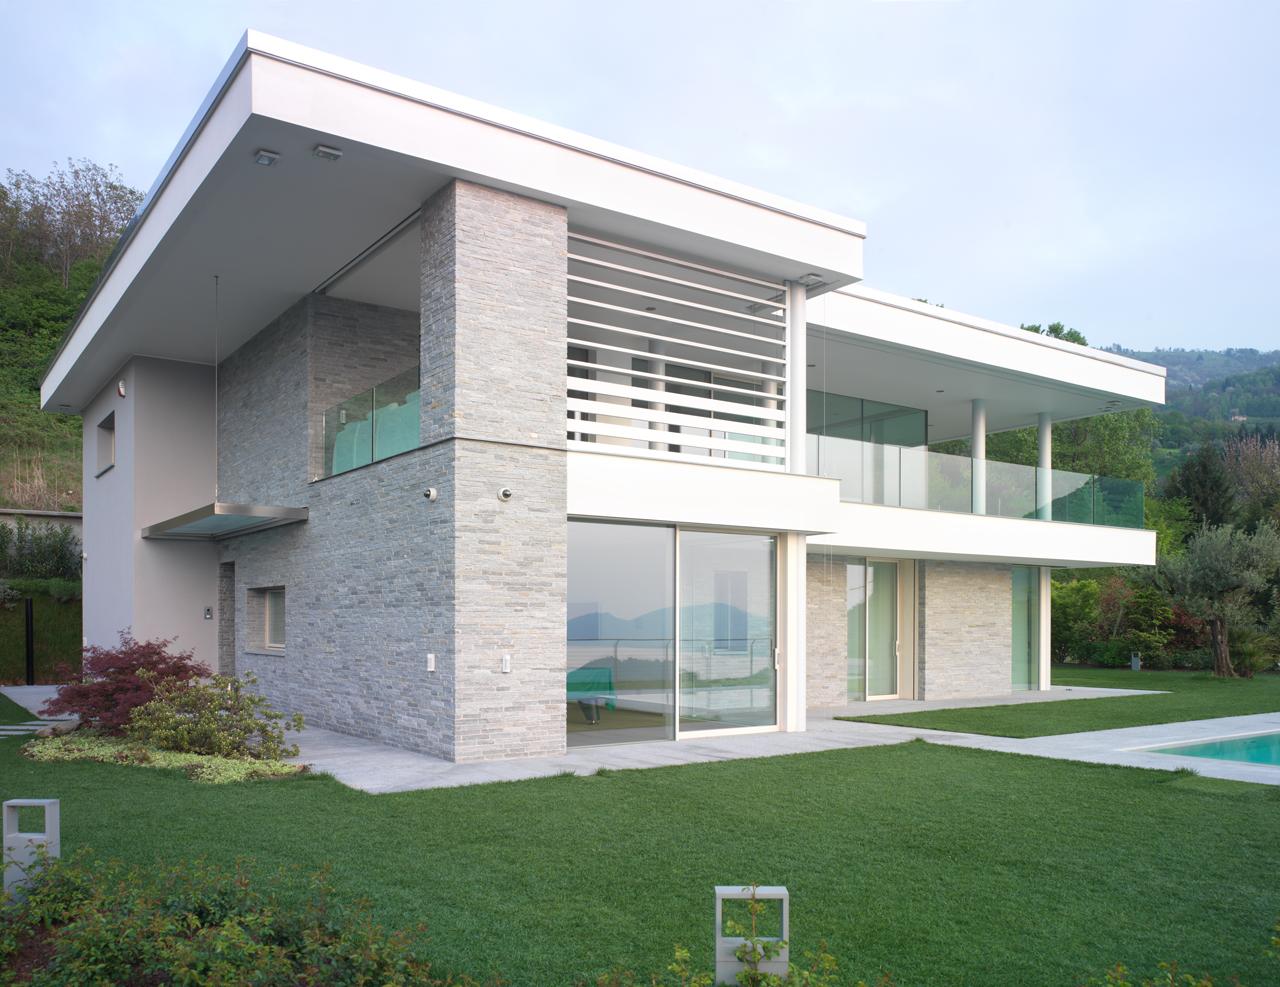 Skyline system minimal frames by carminati serramenti srl for Villa moderna progetto